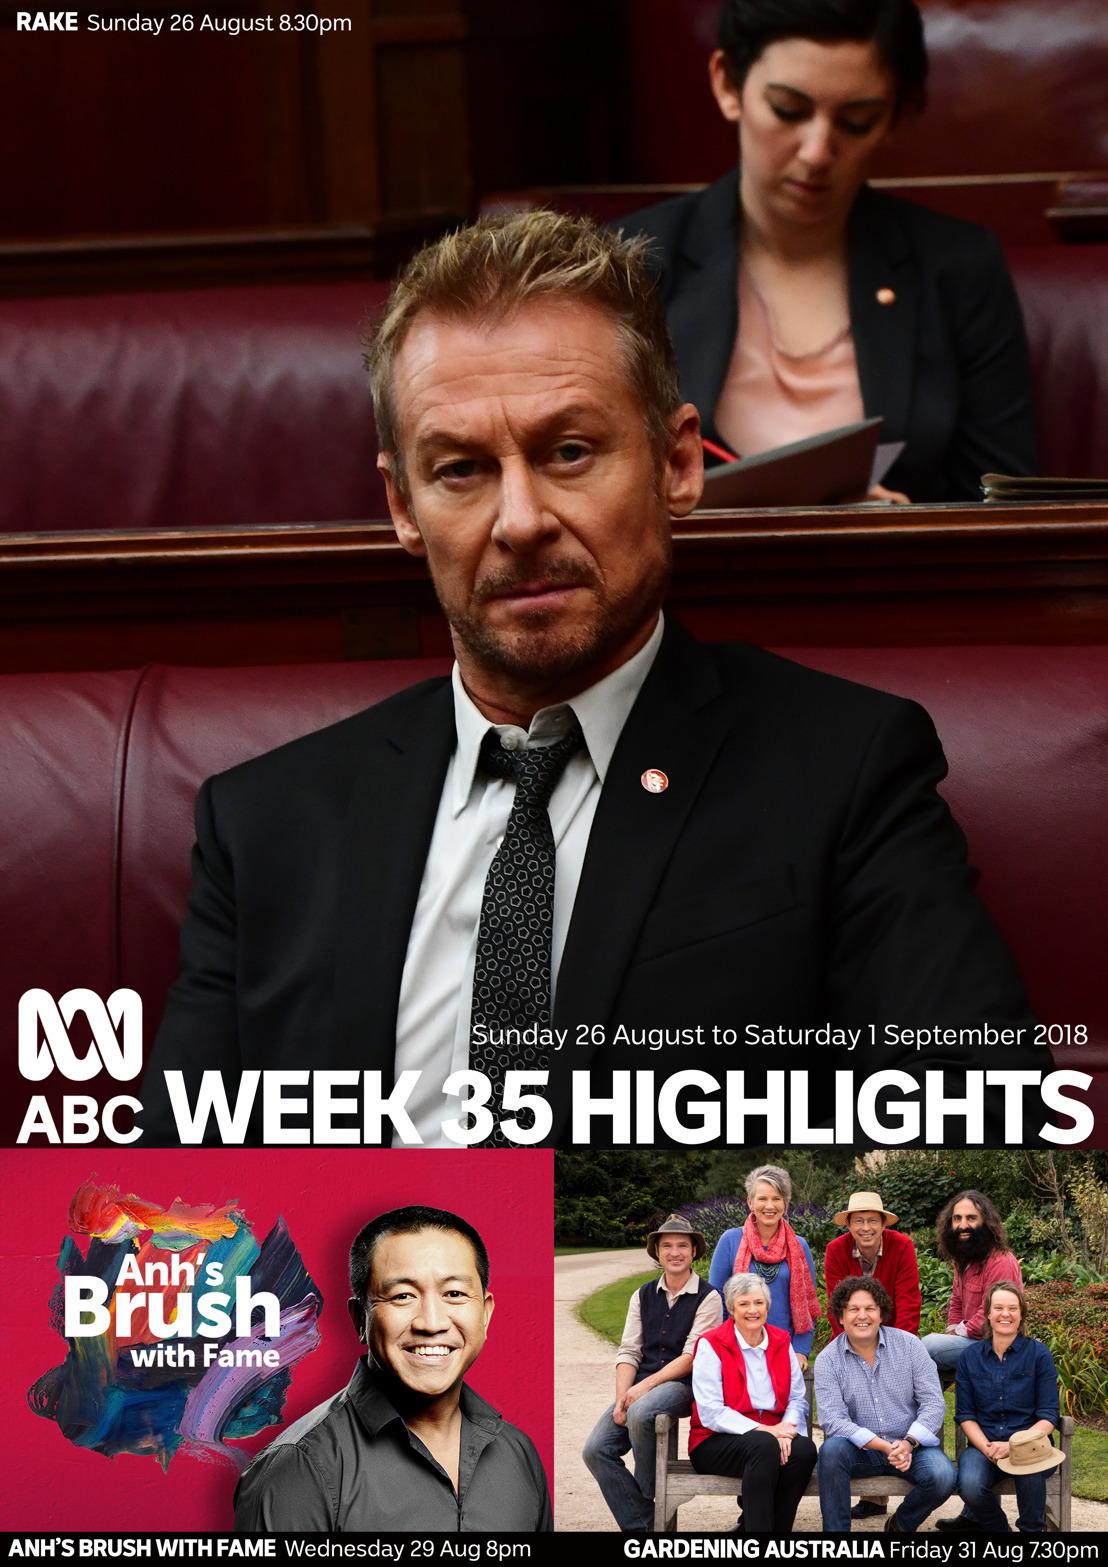 ABC TV Program Highlights - Week 35